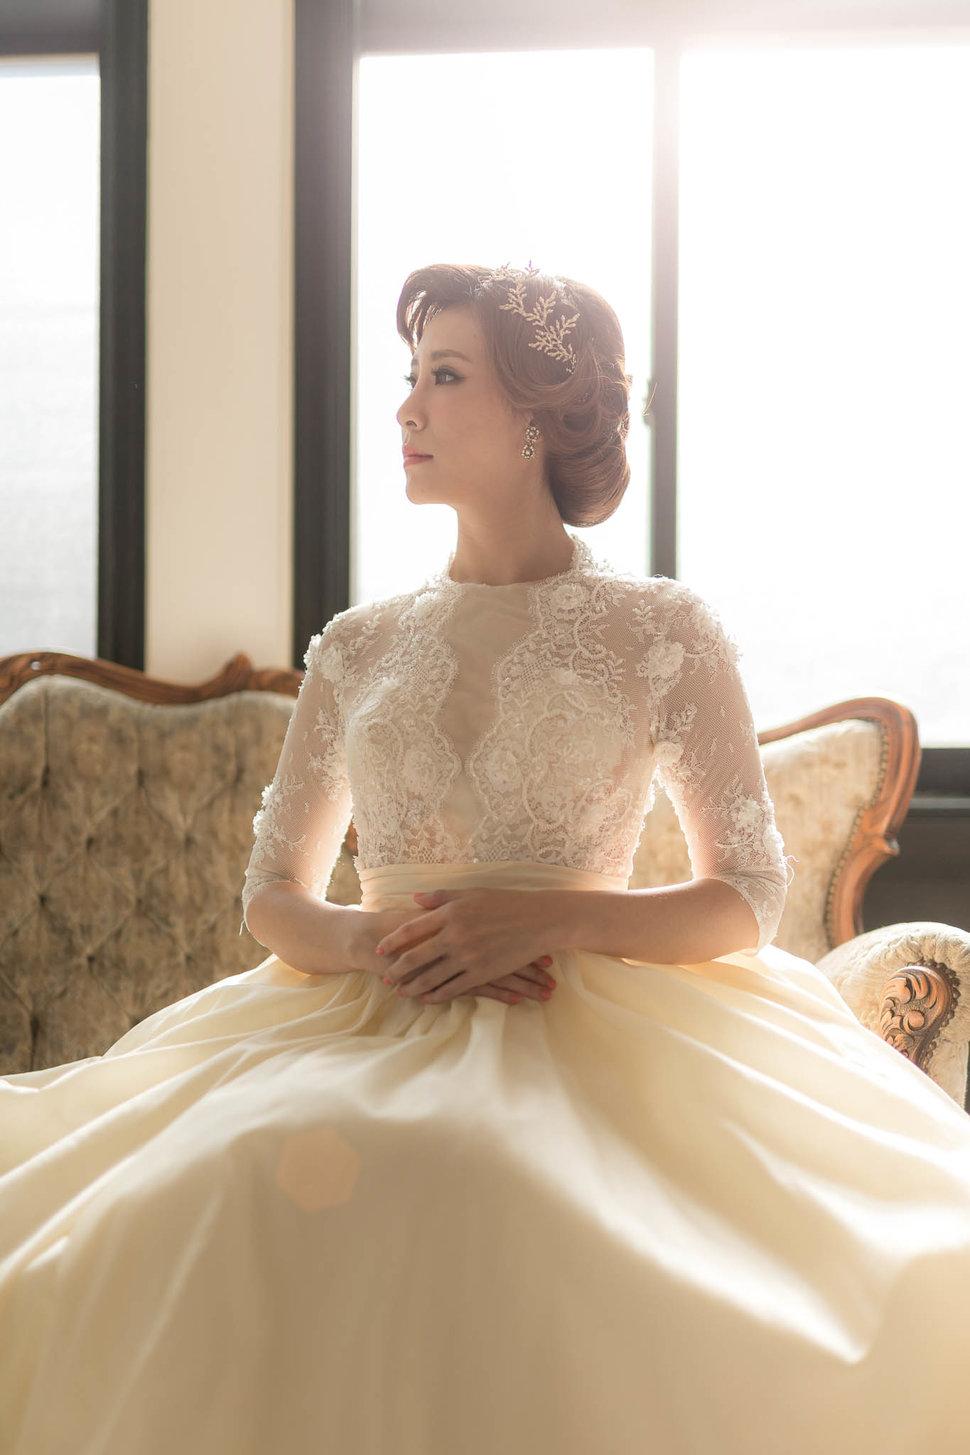 18PHOTO自主婚紗-潤兒(編號:406240) - 18PHOTO 婚紗影像攝影工作室 - 結婚吧